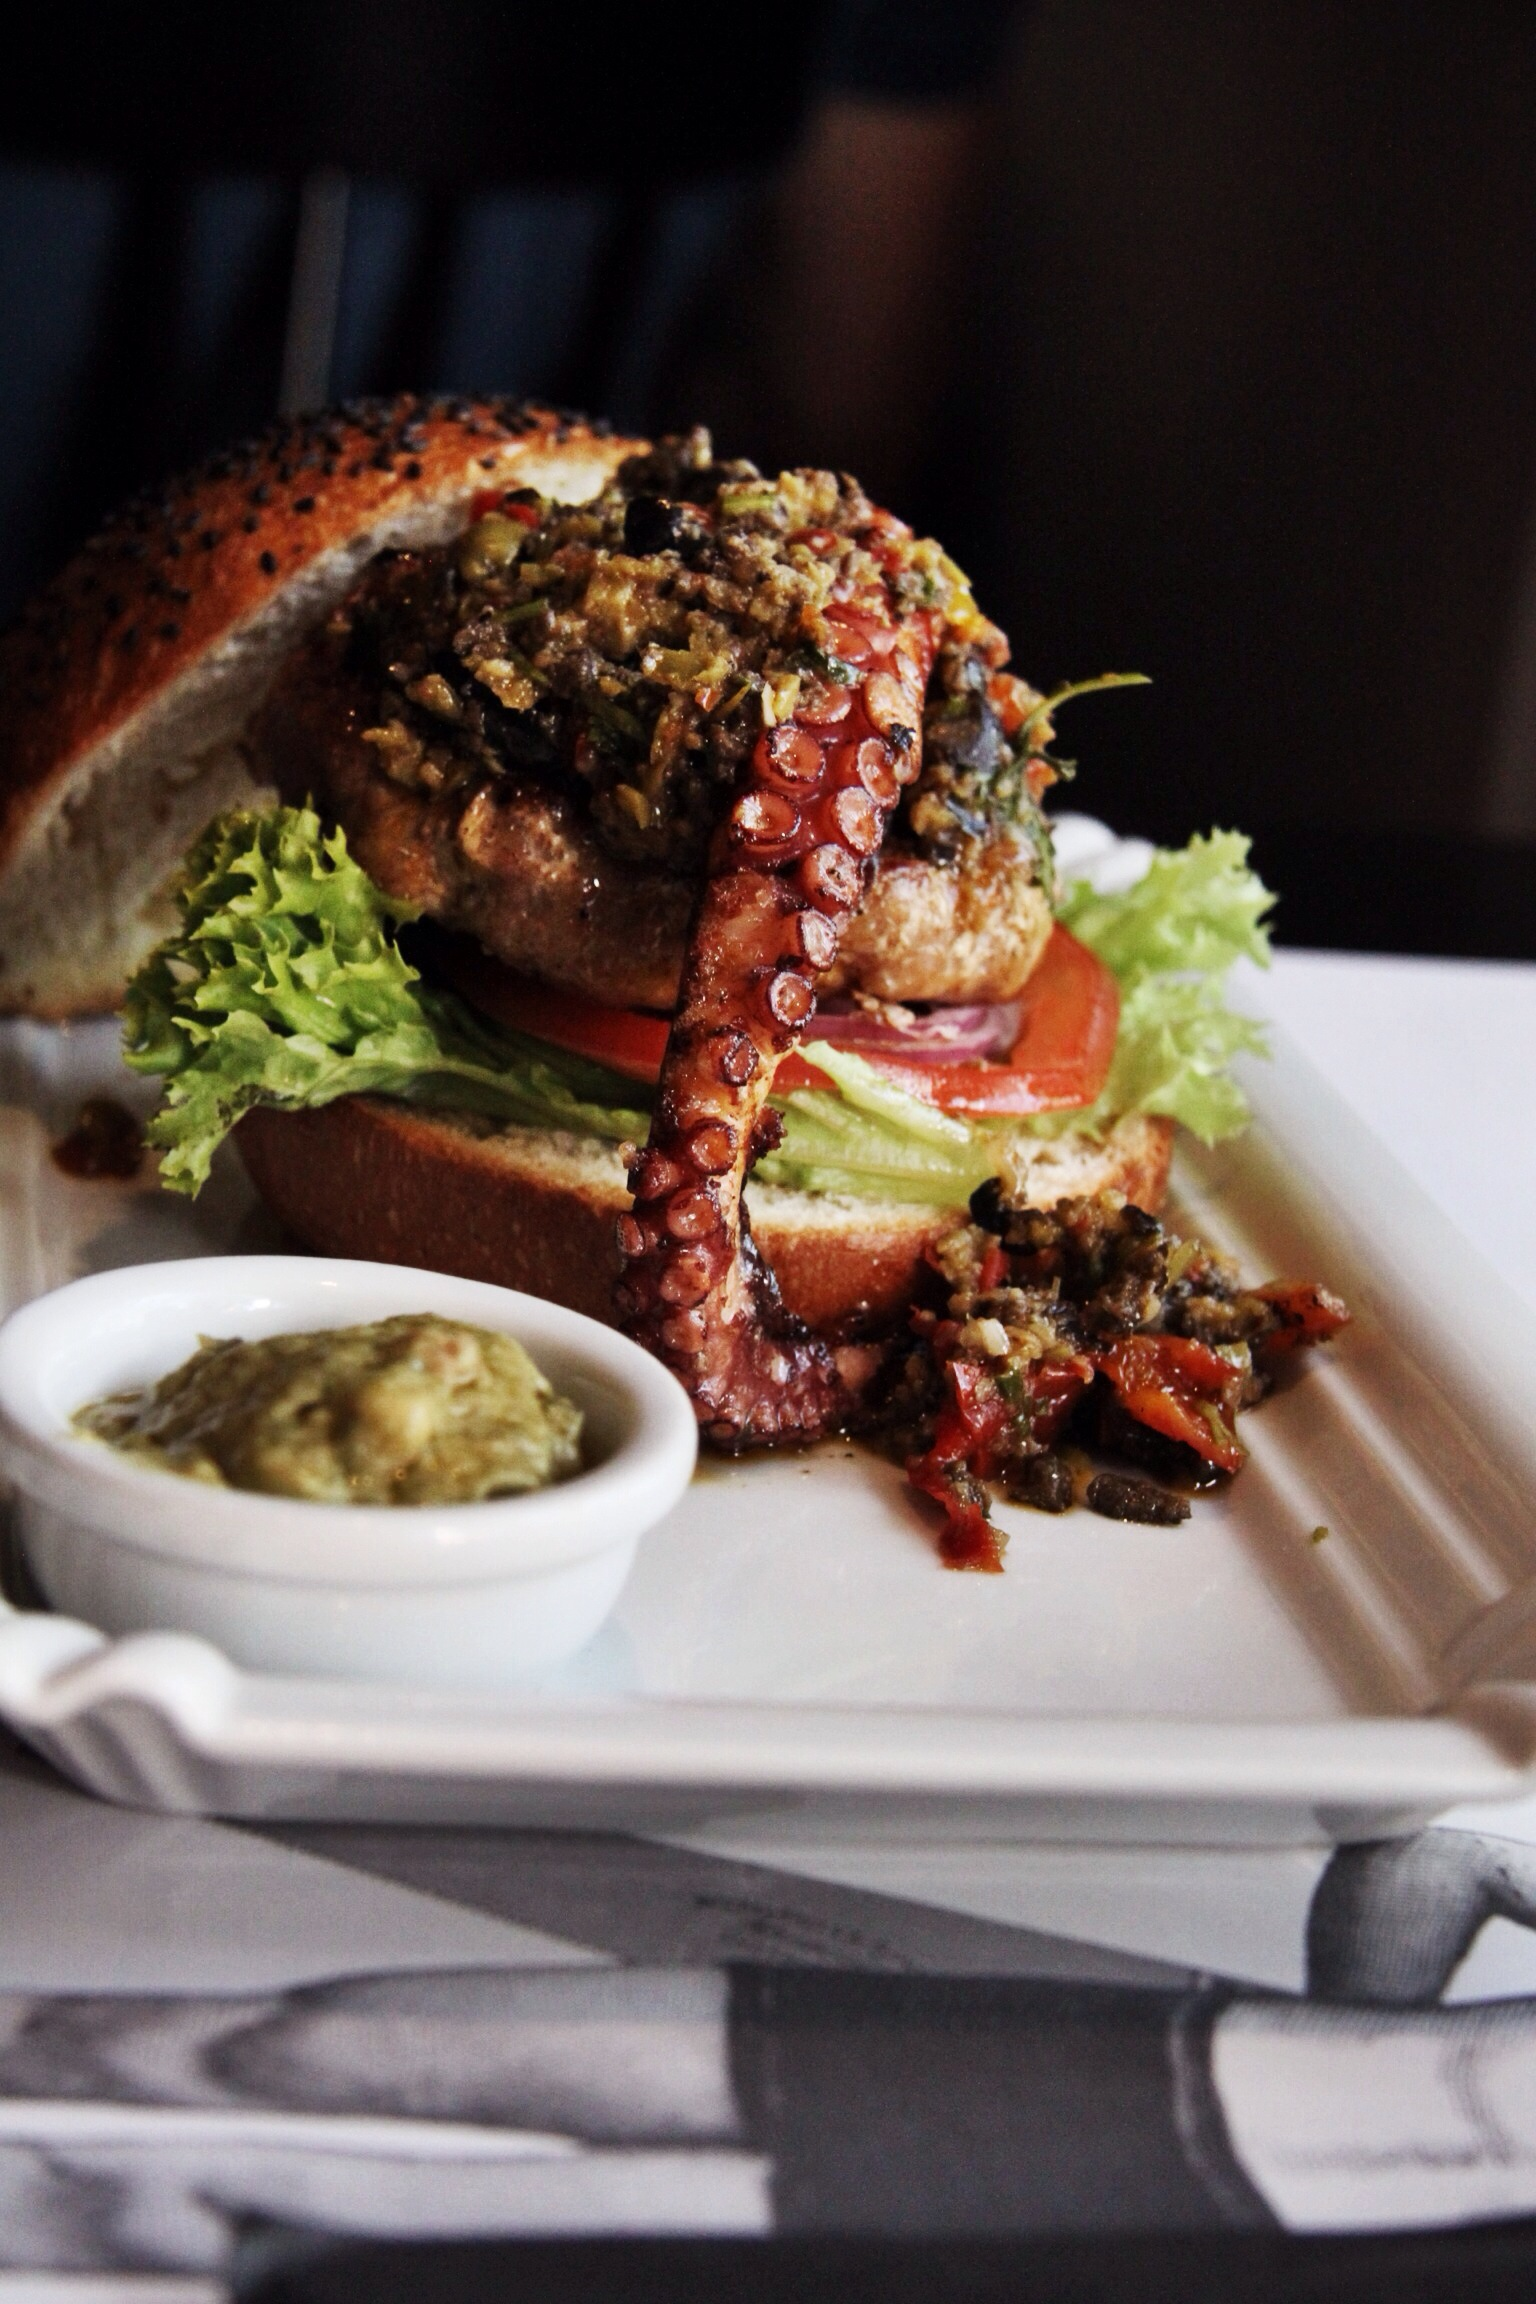 The Pulpo 'n' Pork Burger